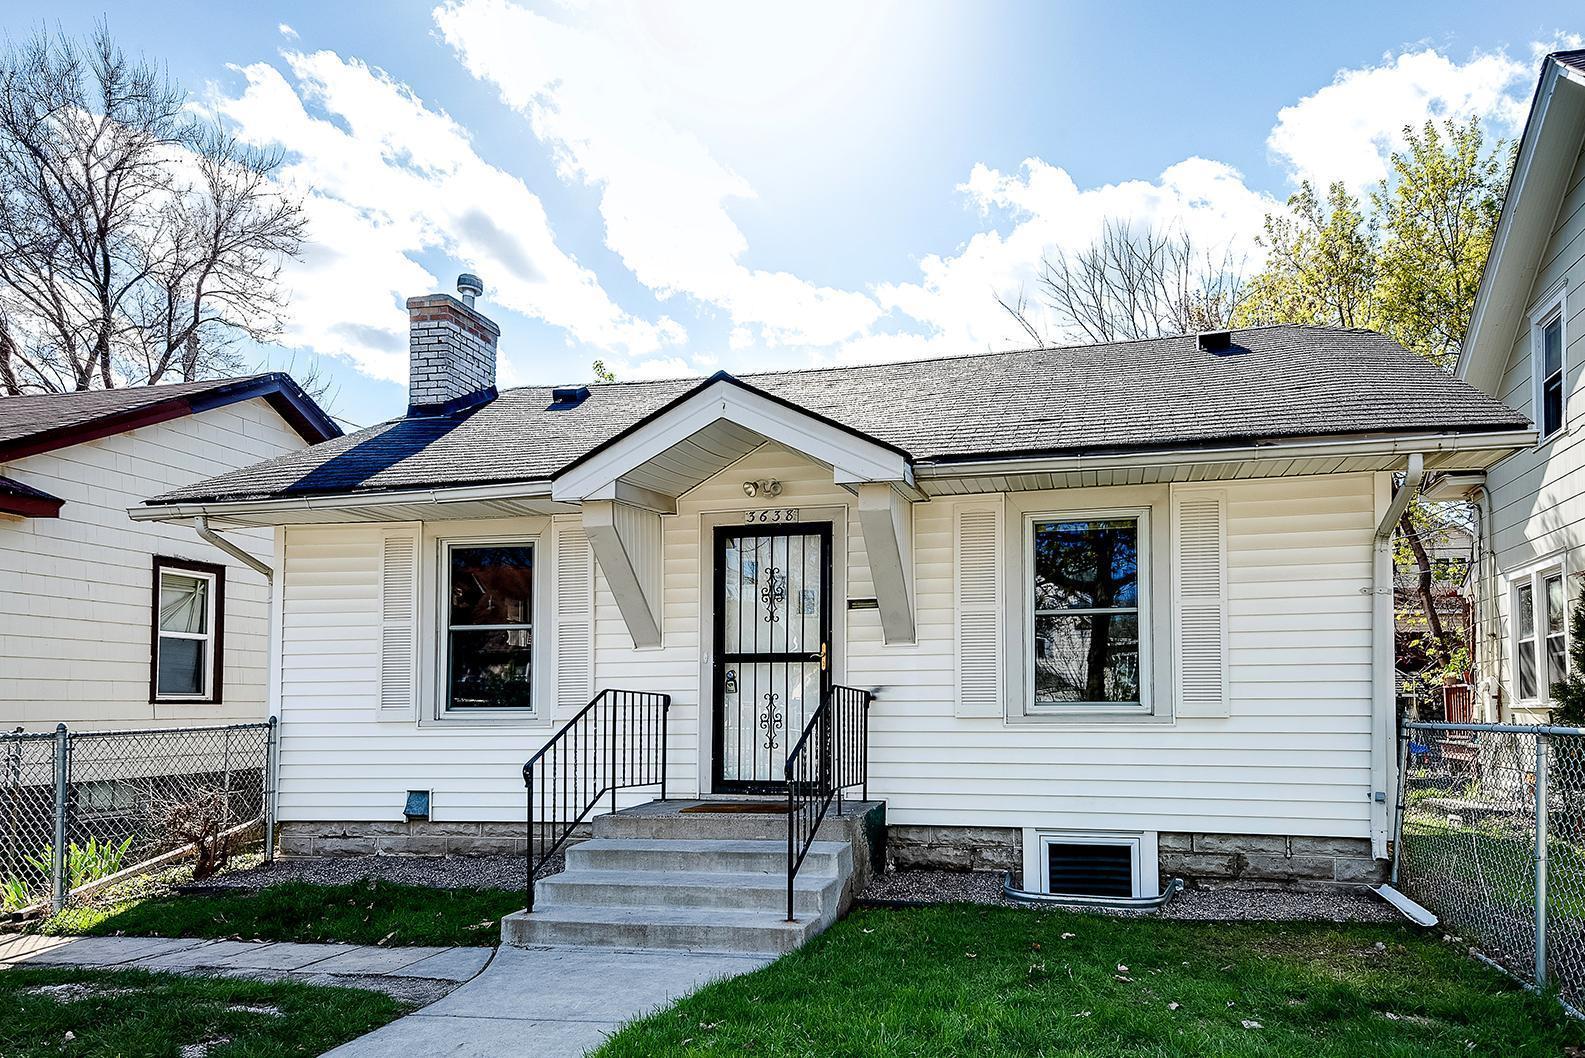 3638 Oakland Avenue, Minneapolis MN 55407 - Photo 1